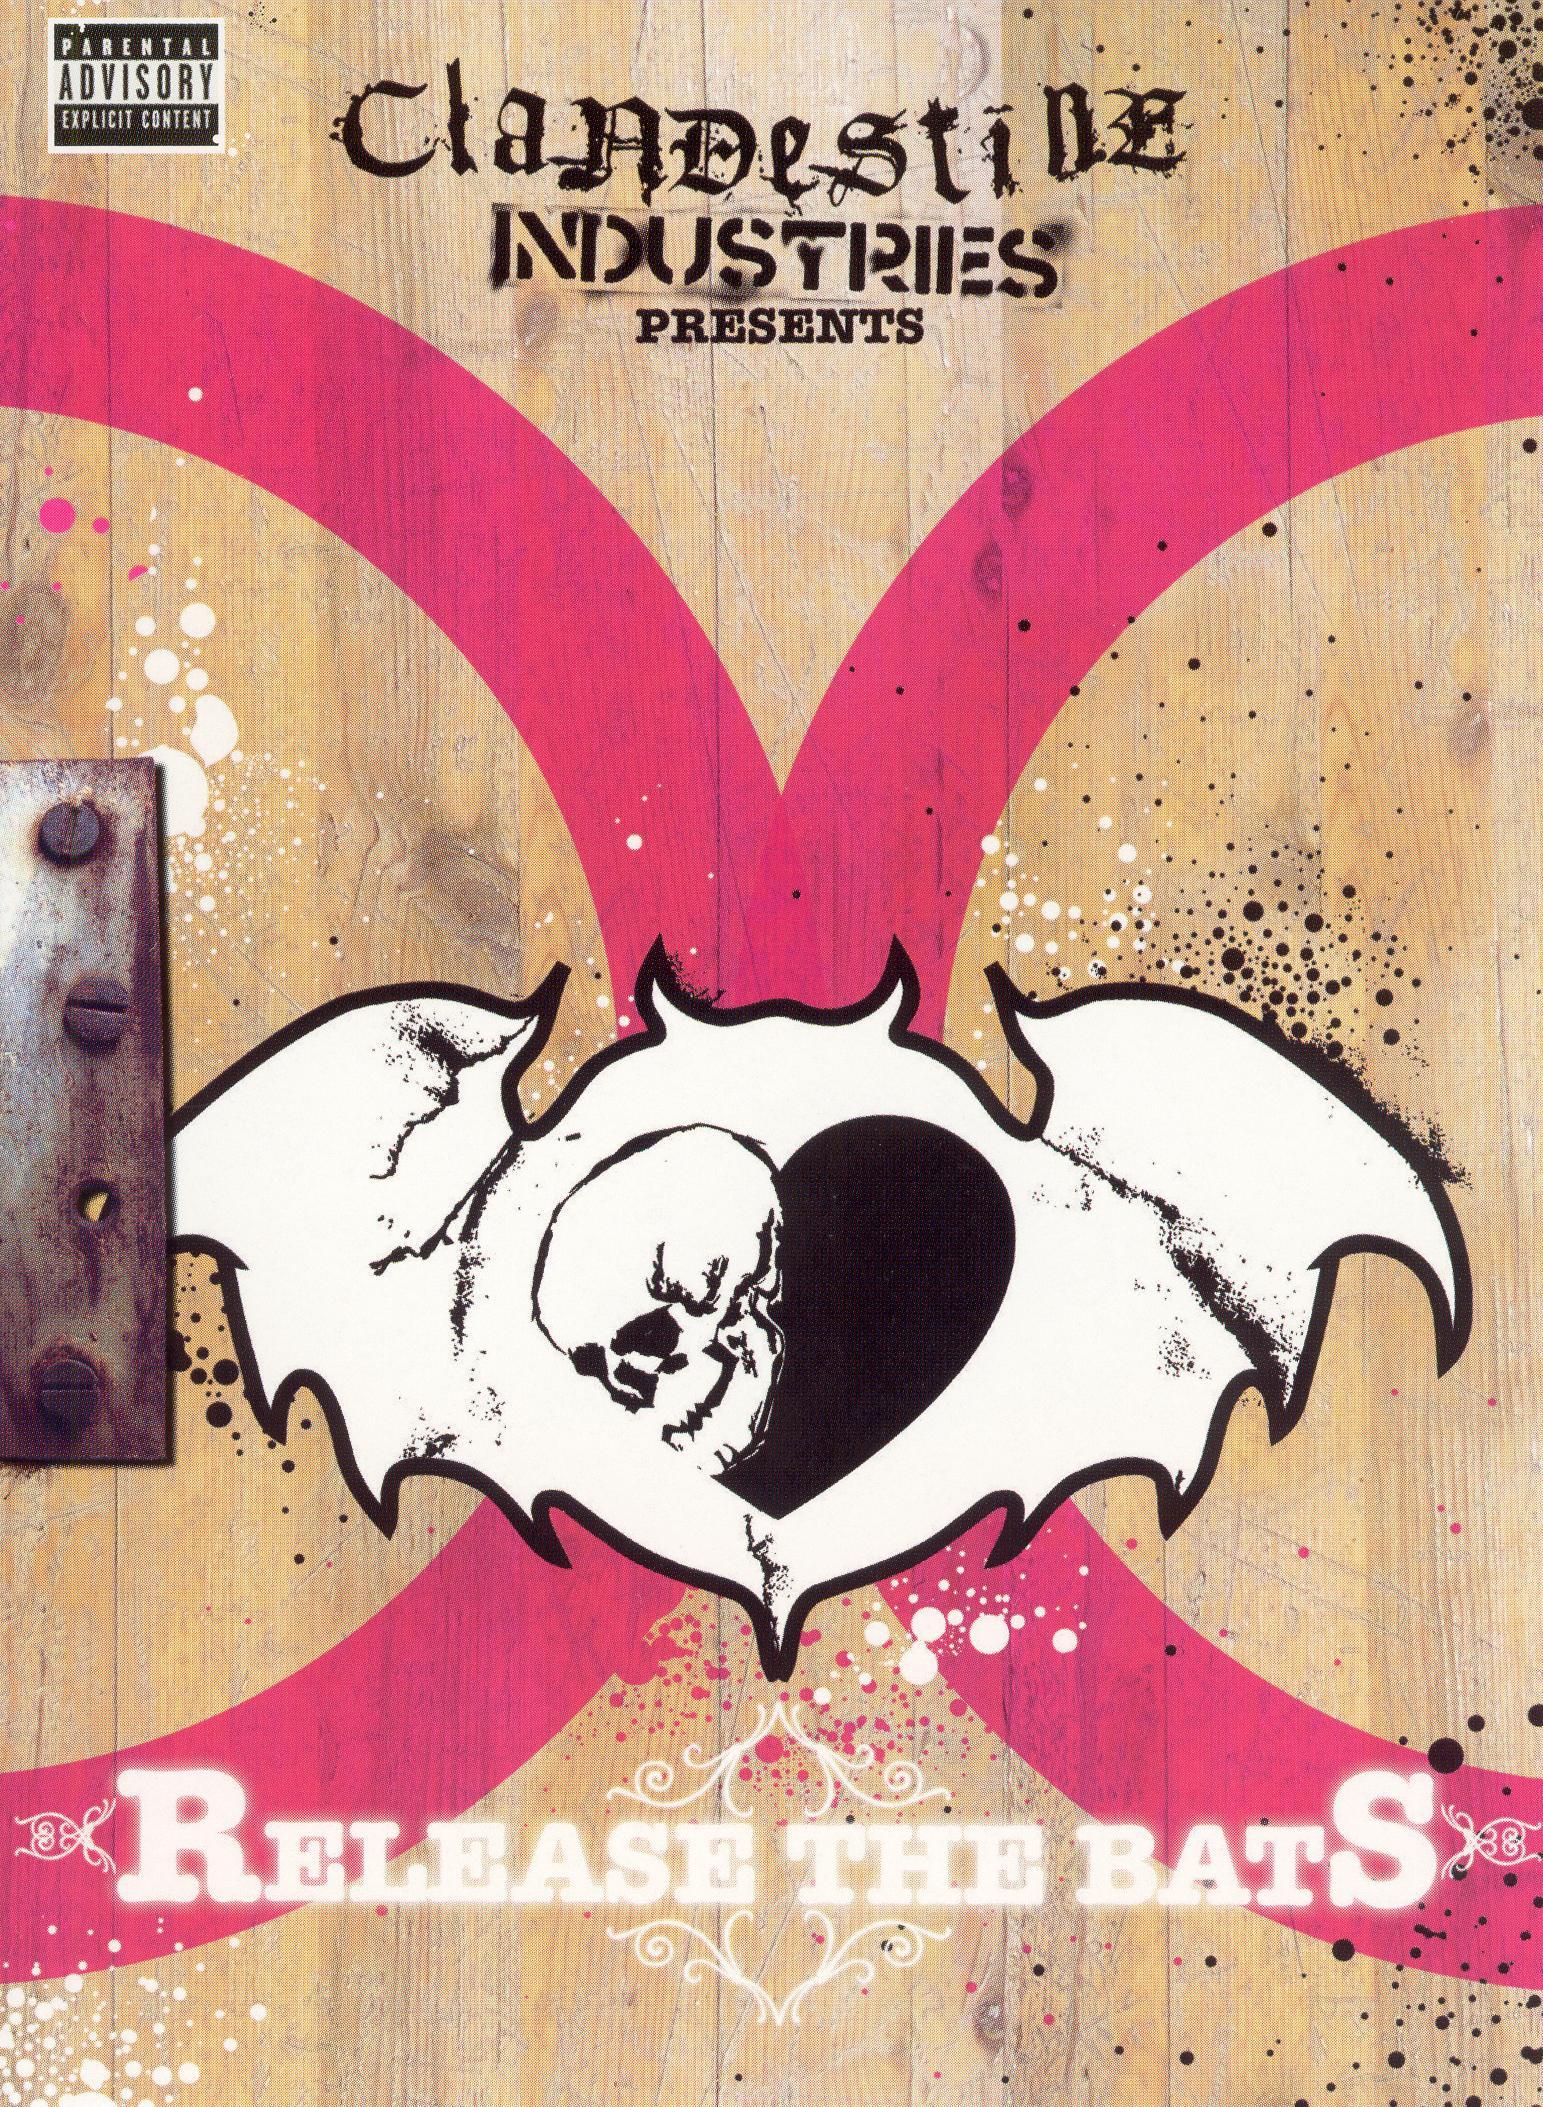 Clandestine Industries Presents Release the Bats